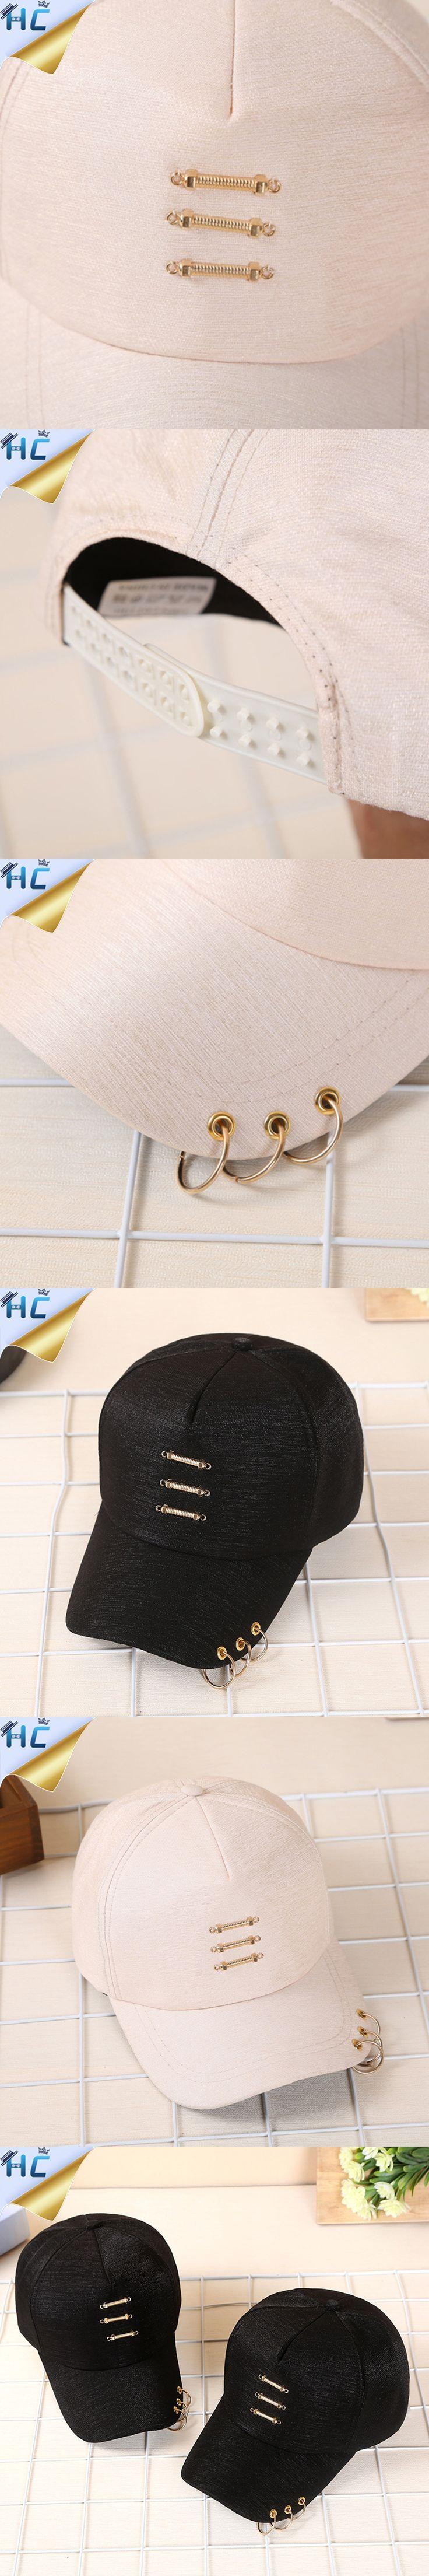 New Korean Harajuku Gd Unisex Solid Ring Safety Pin curved Bone Hat Baseball Cap Women Men Cotton snapback caps casquette gorras